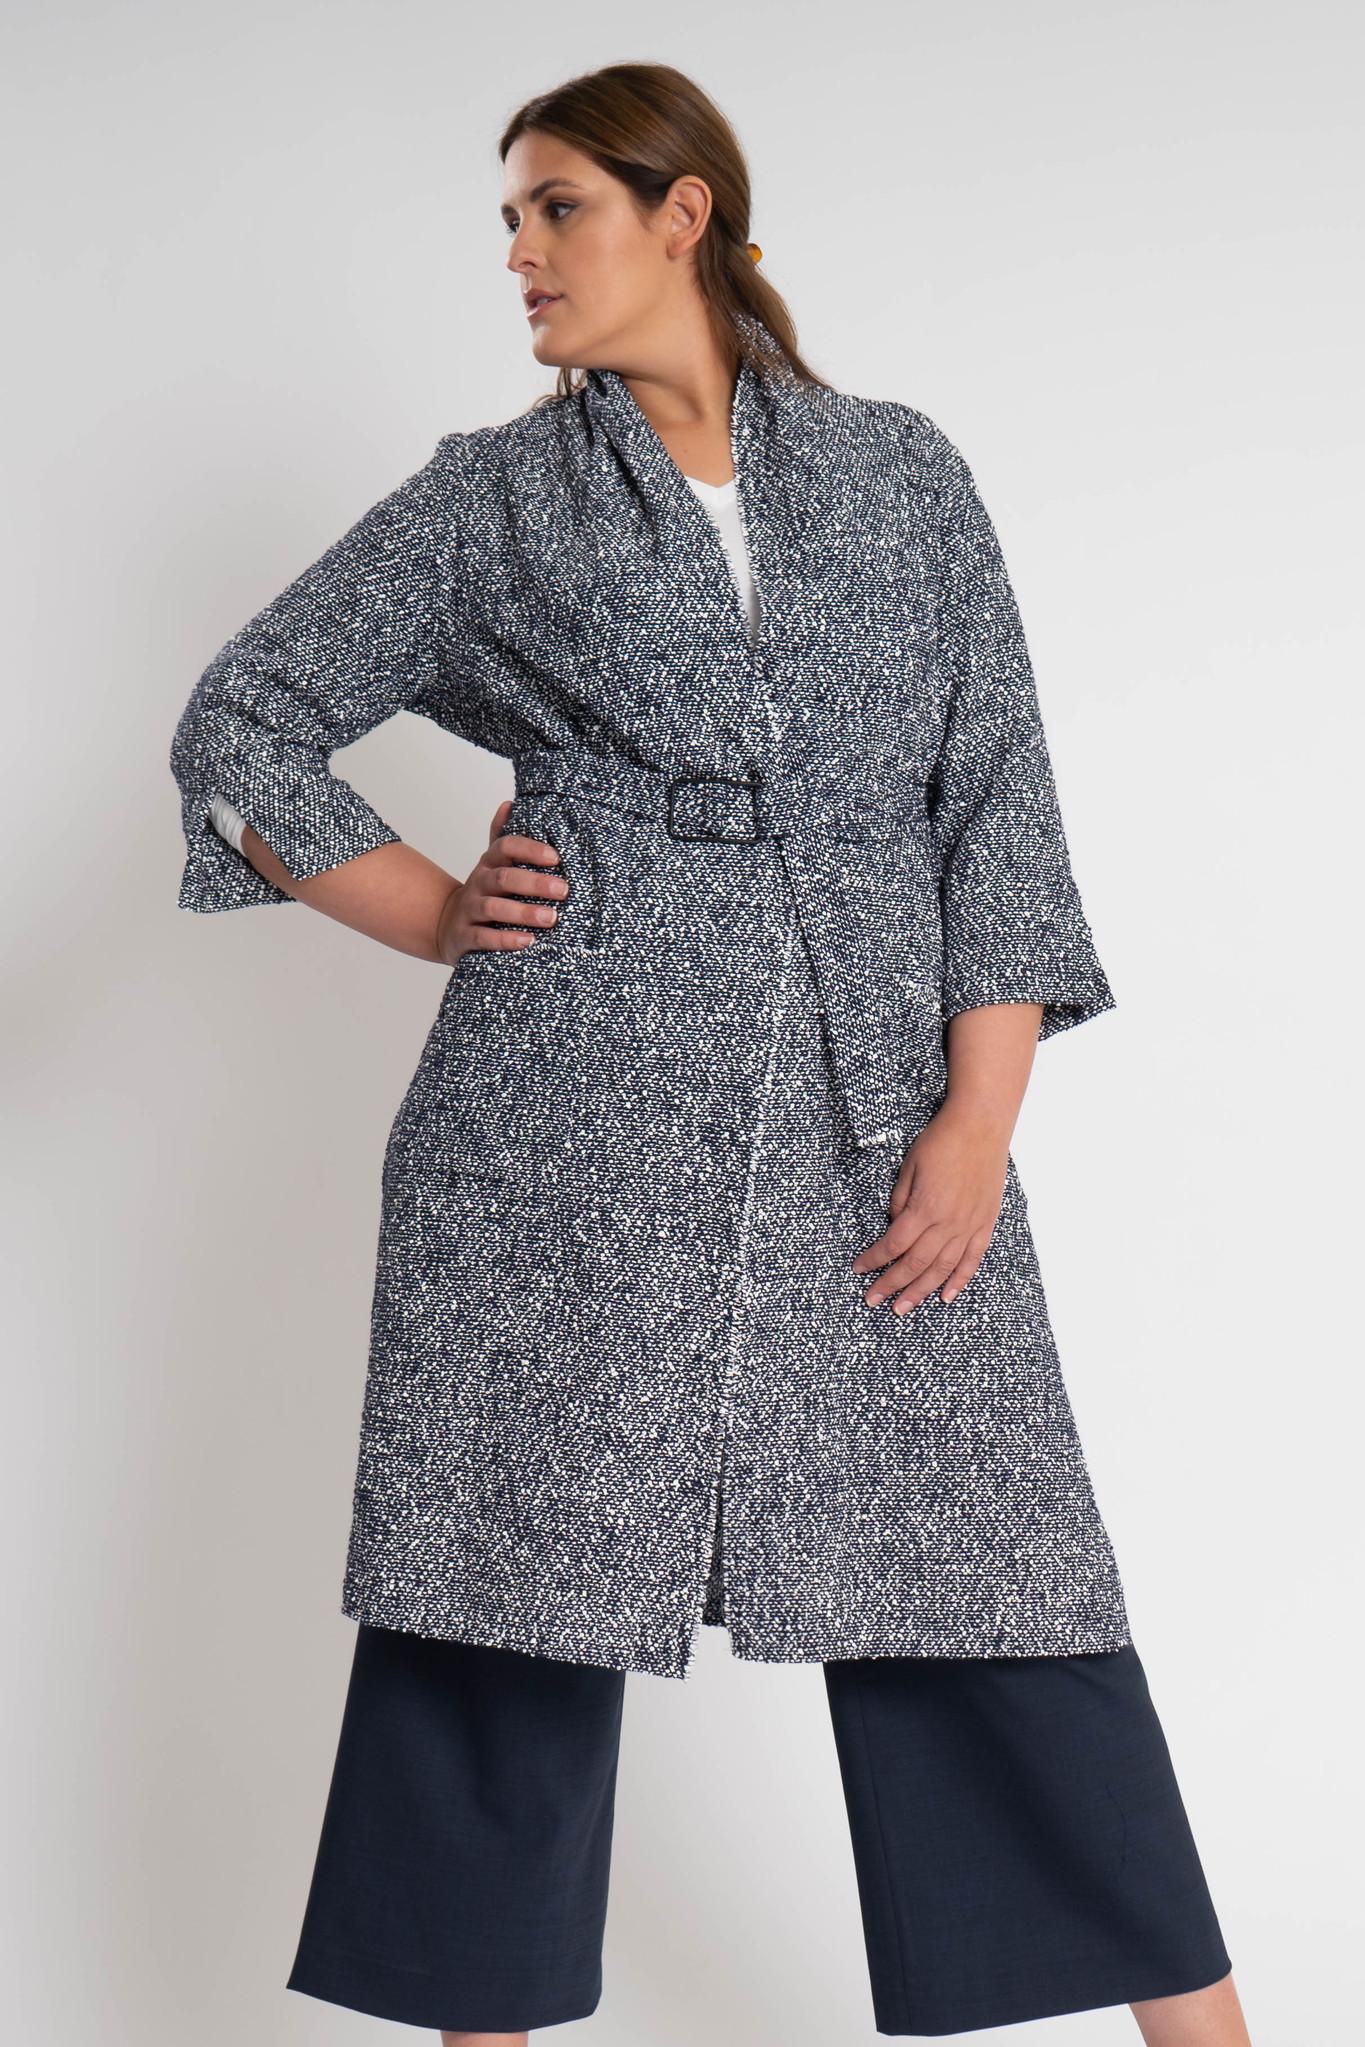 KARINA Jacket in fine Cotton-Bouclé-1